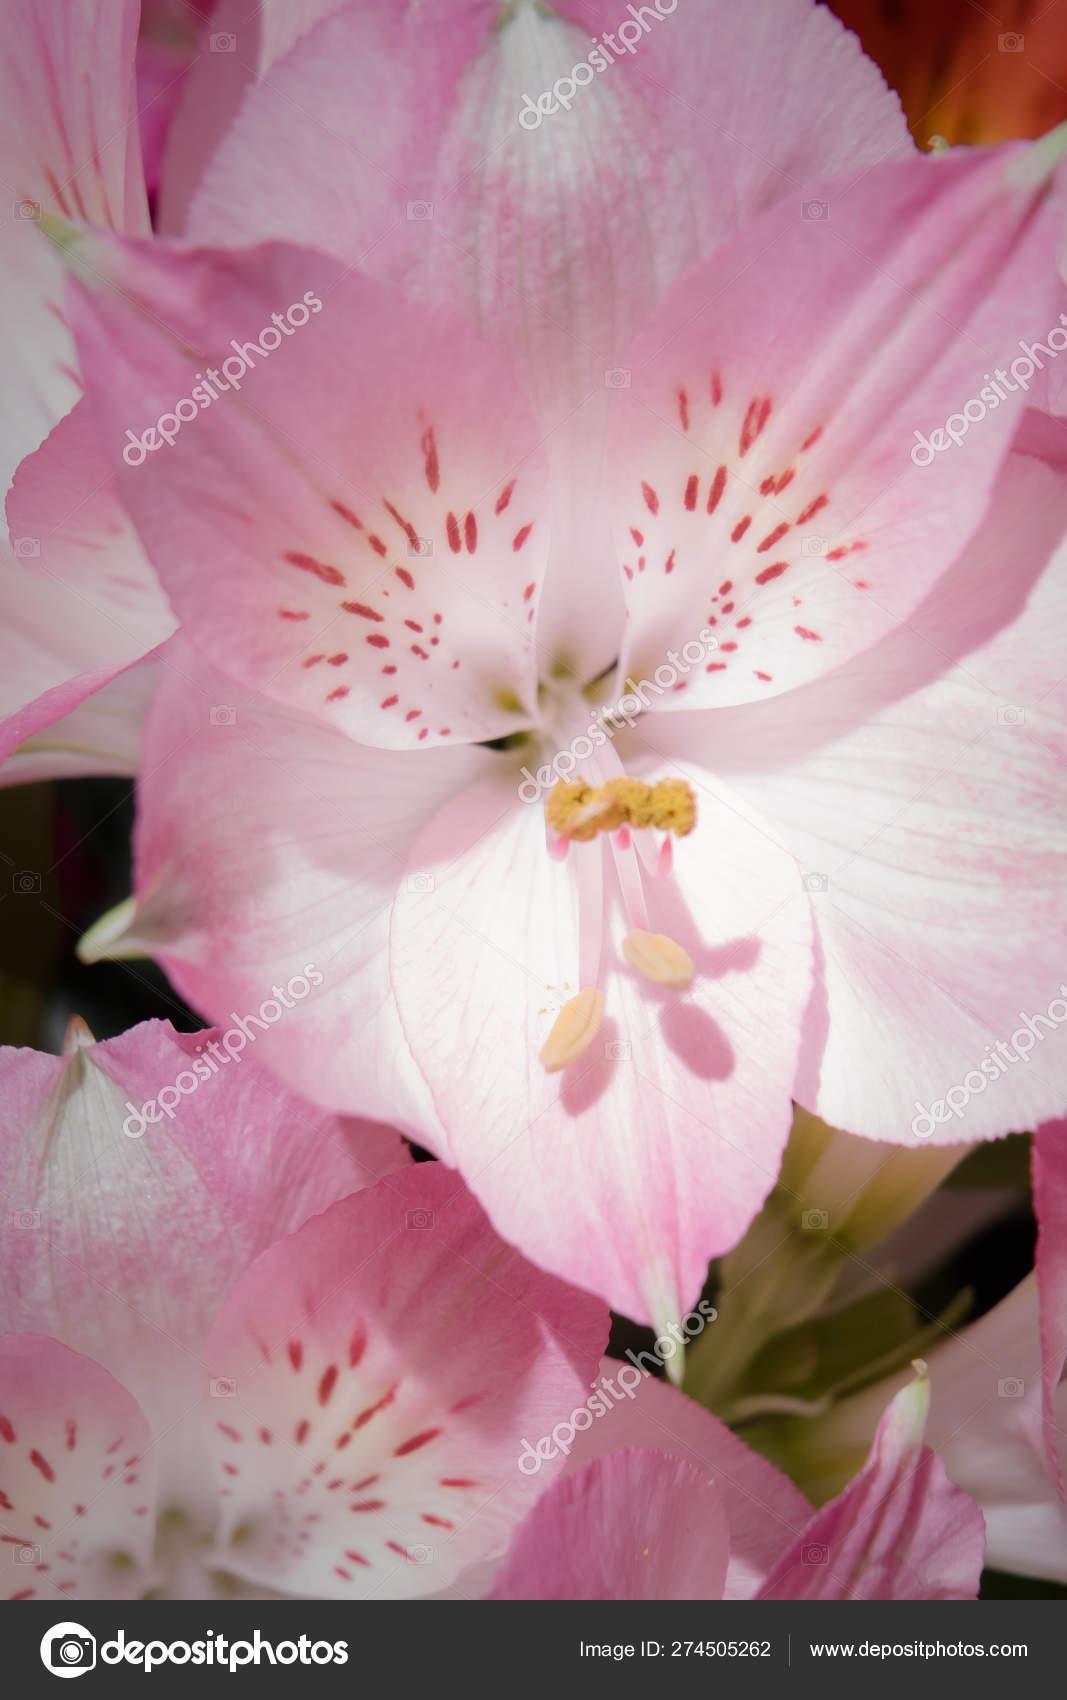 Peruvian Lily Alstroemeria Flowers Stock Photo C 6505307 Gmail Com 274505262